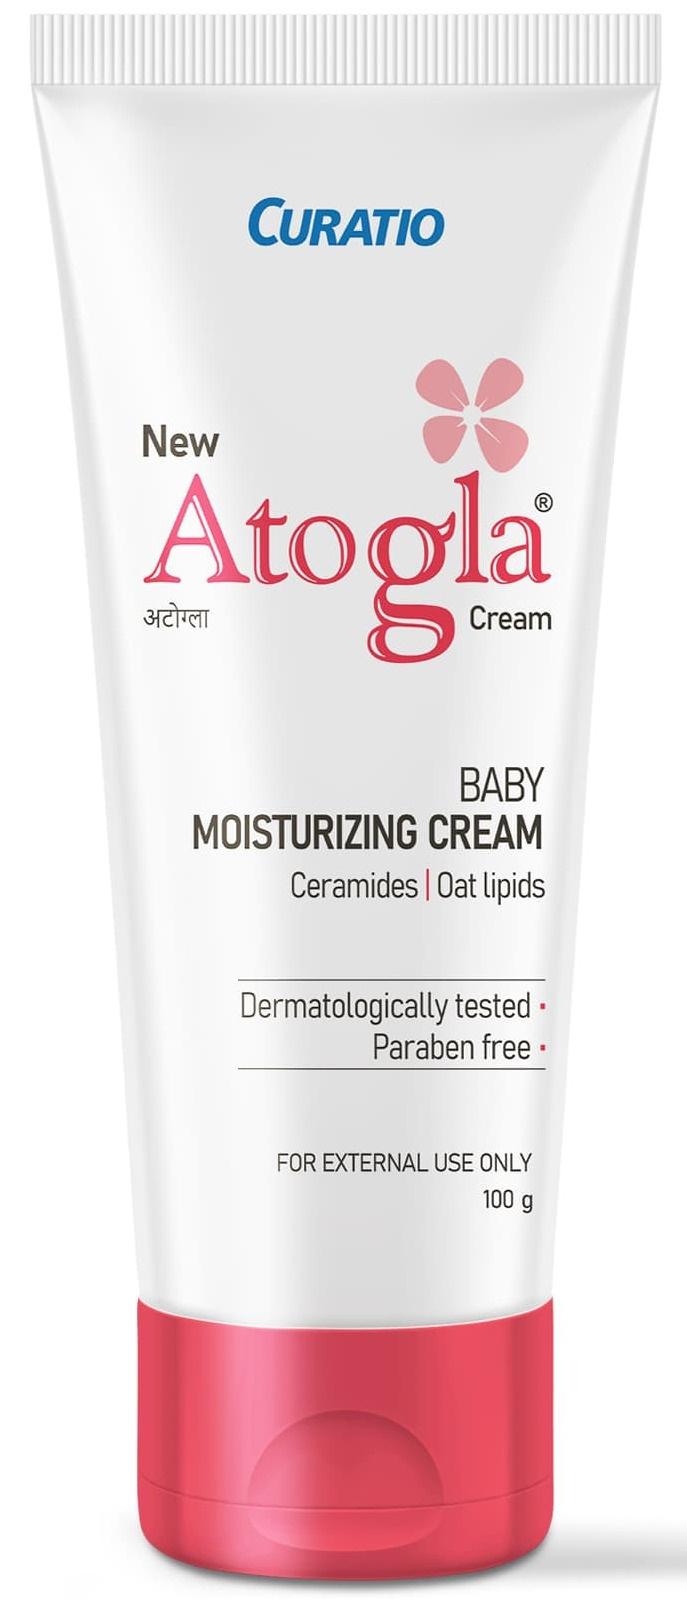 Curatio Atogla Baby Cream